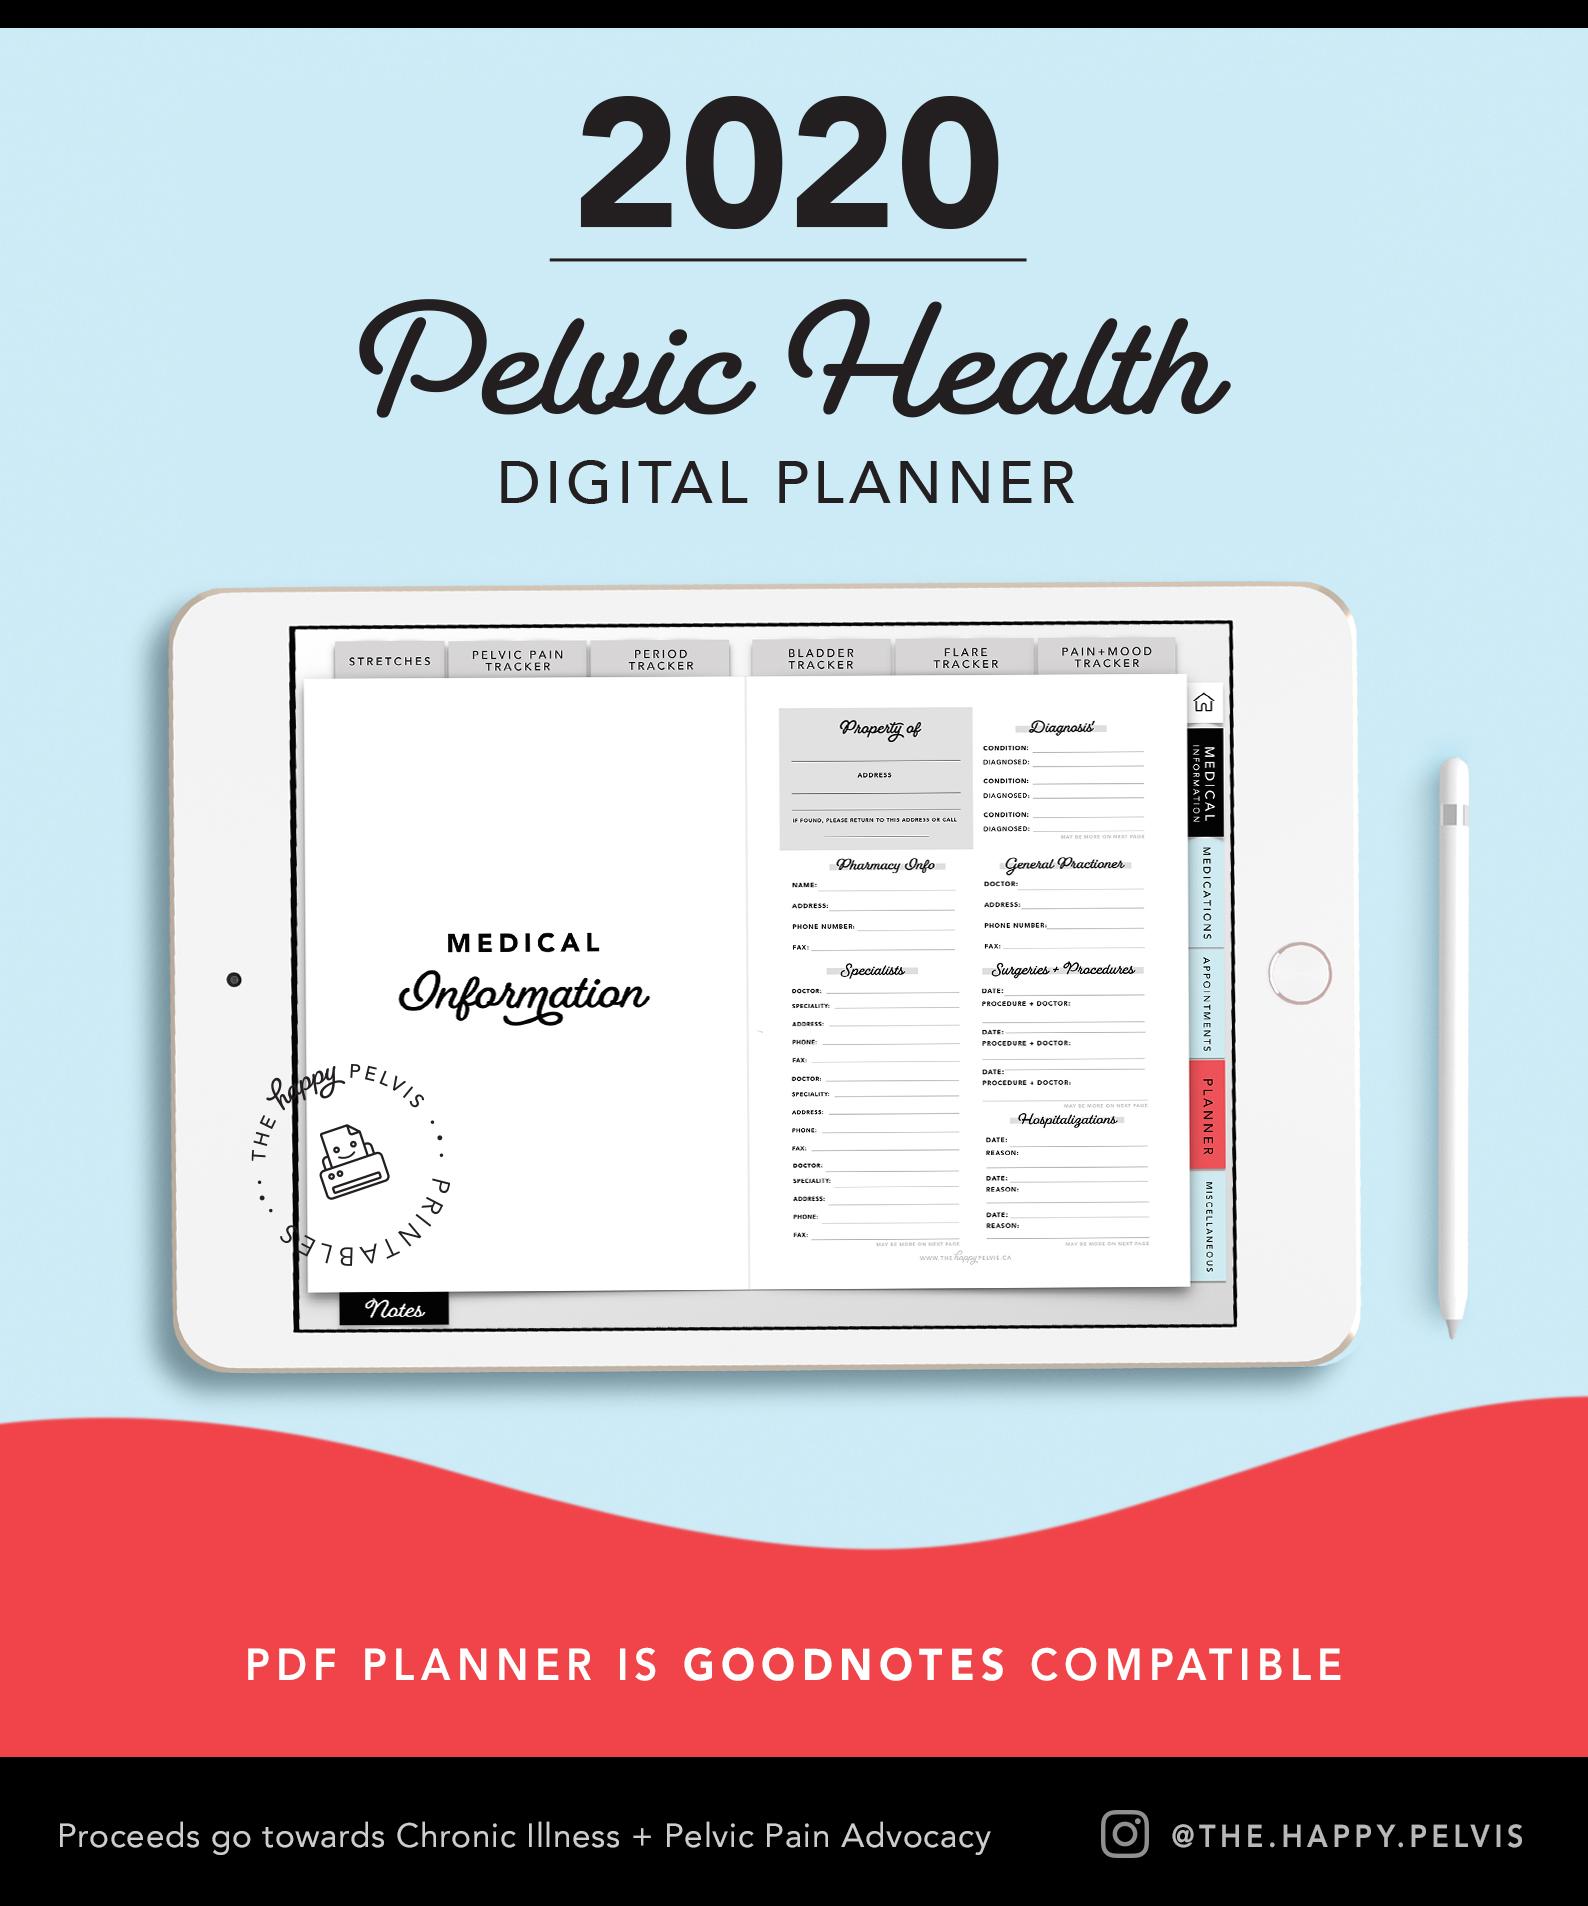 2020_Digital_Planner_Medical_Pelvic Health